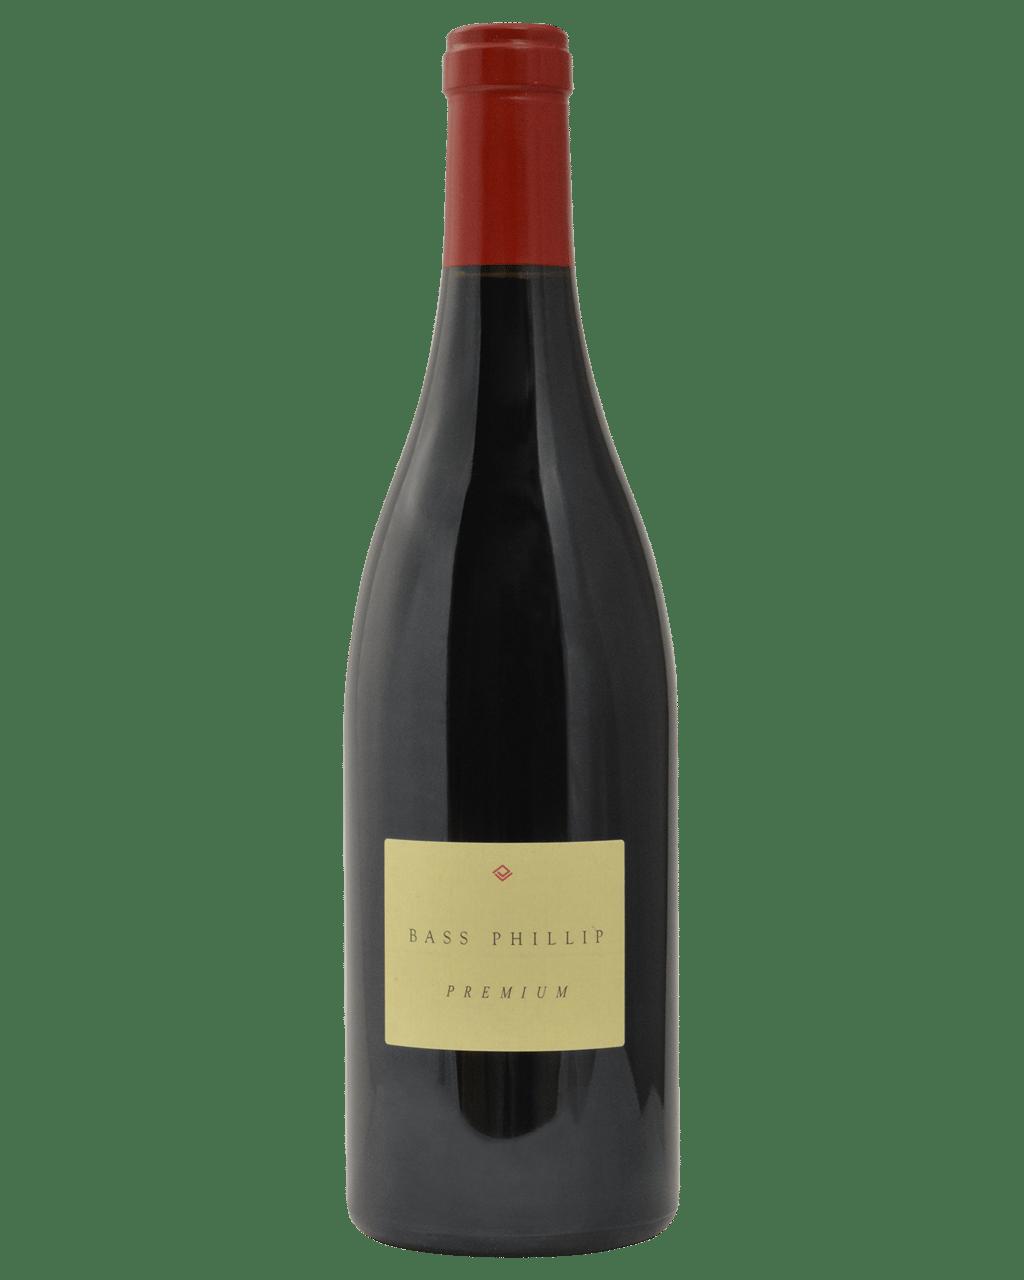 Buy Bass Phillip Premium Pinot Noir 2011 | Dan Murphy's